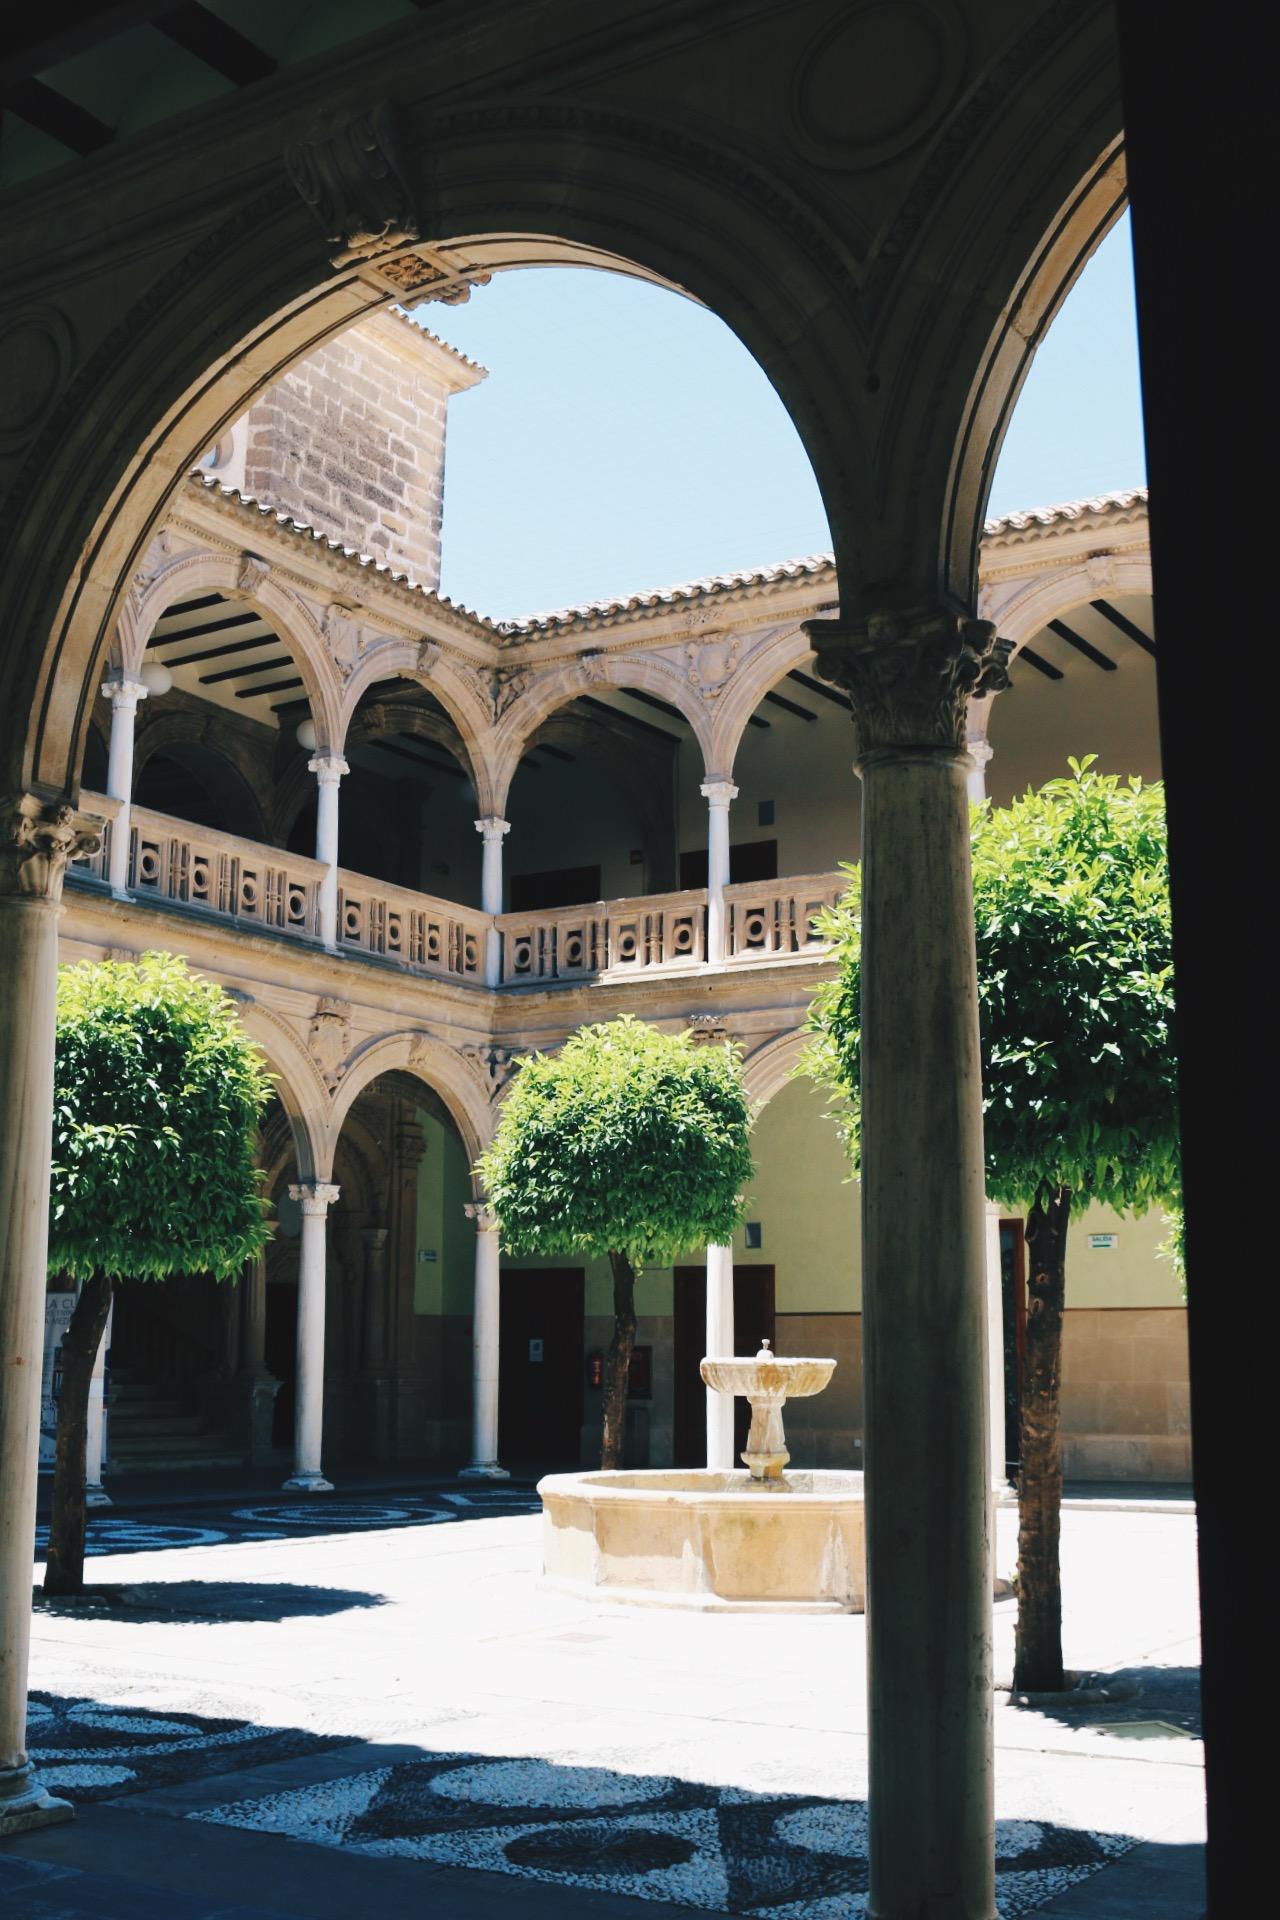 INSIDE PALACIO DE JABALQUINTO